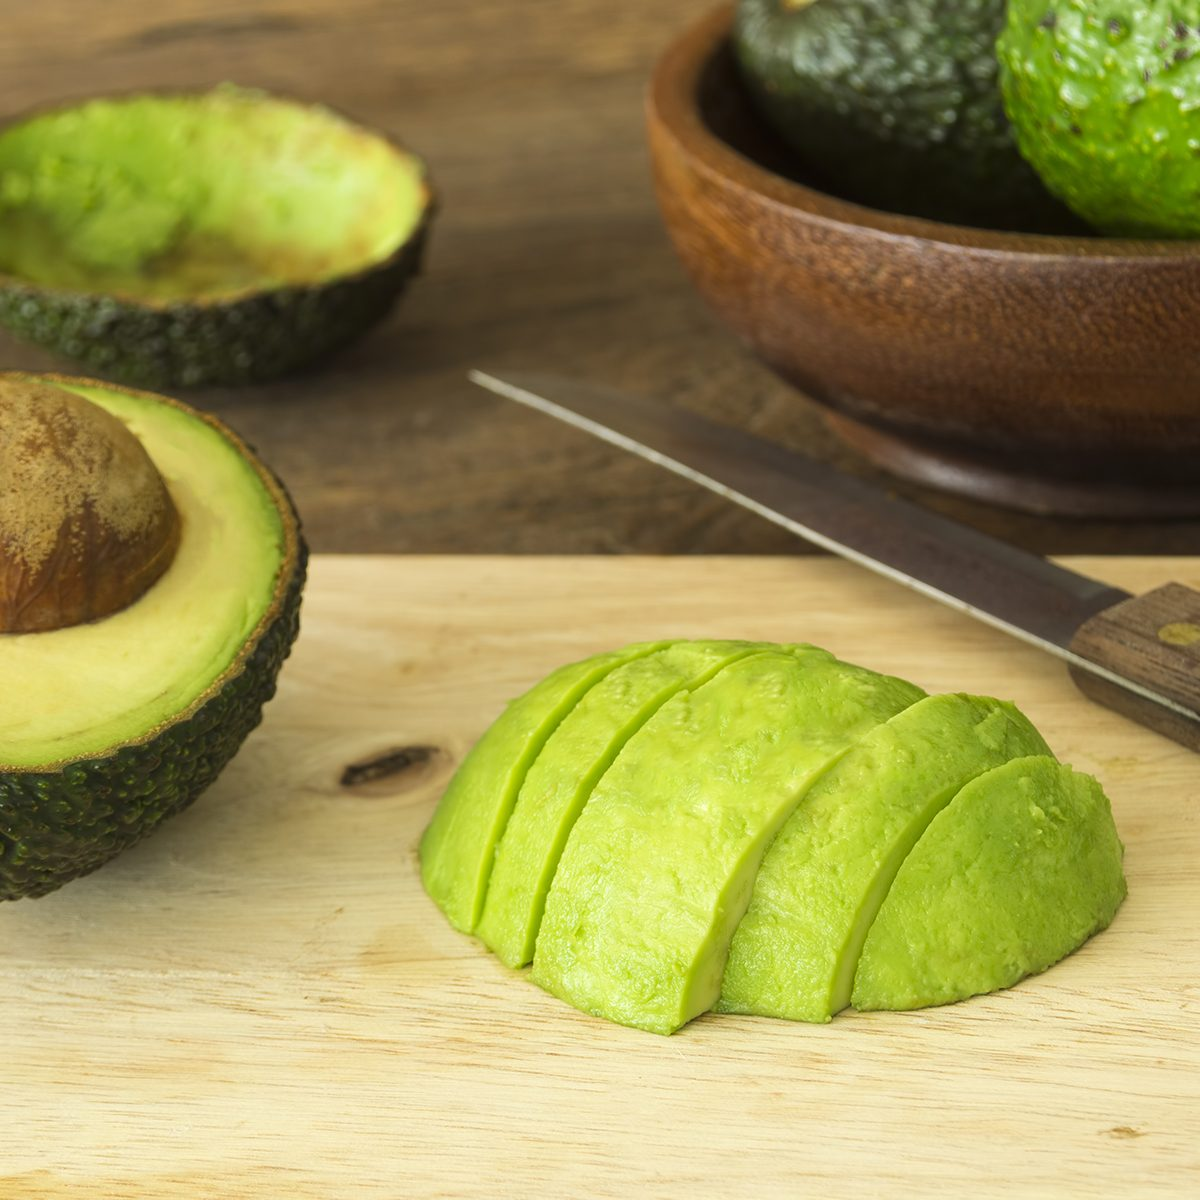 avocado and Sliced avocado slices on wooden board